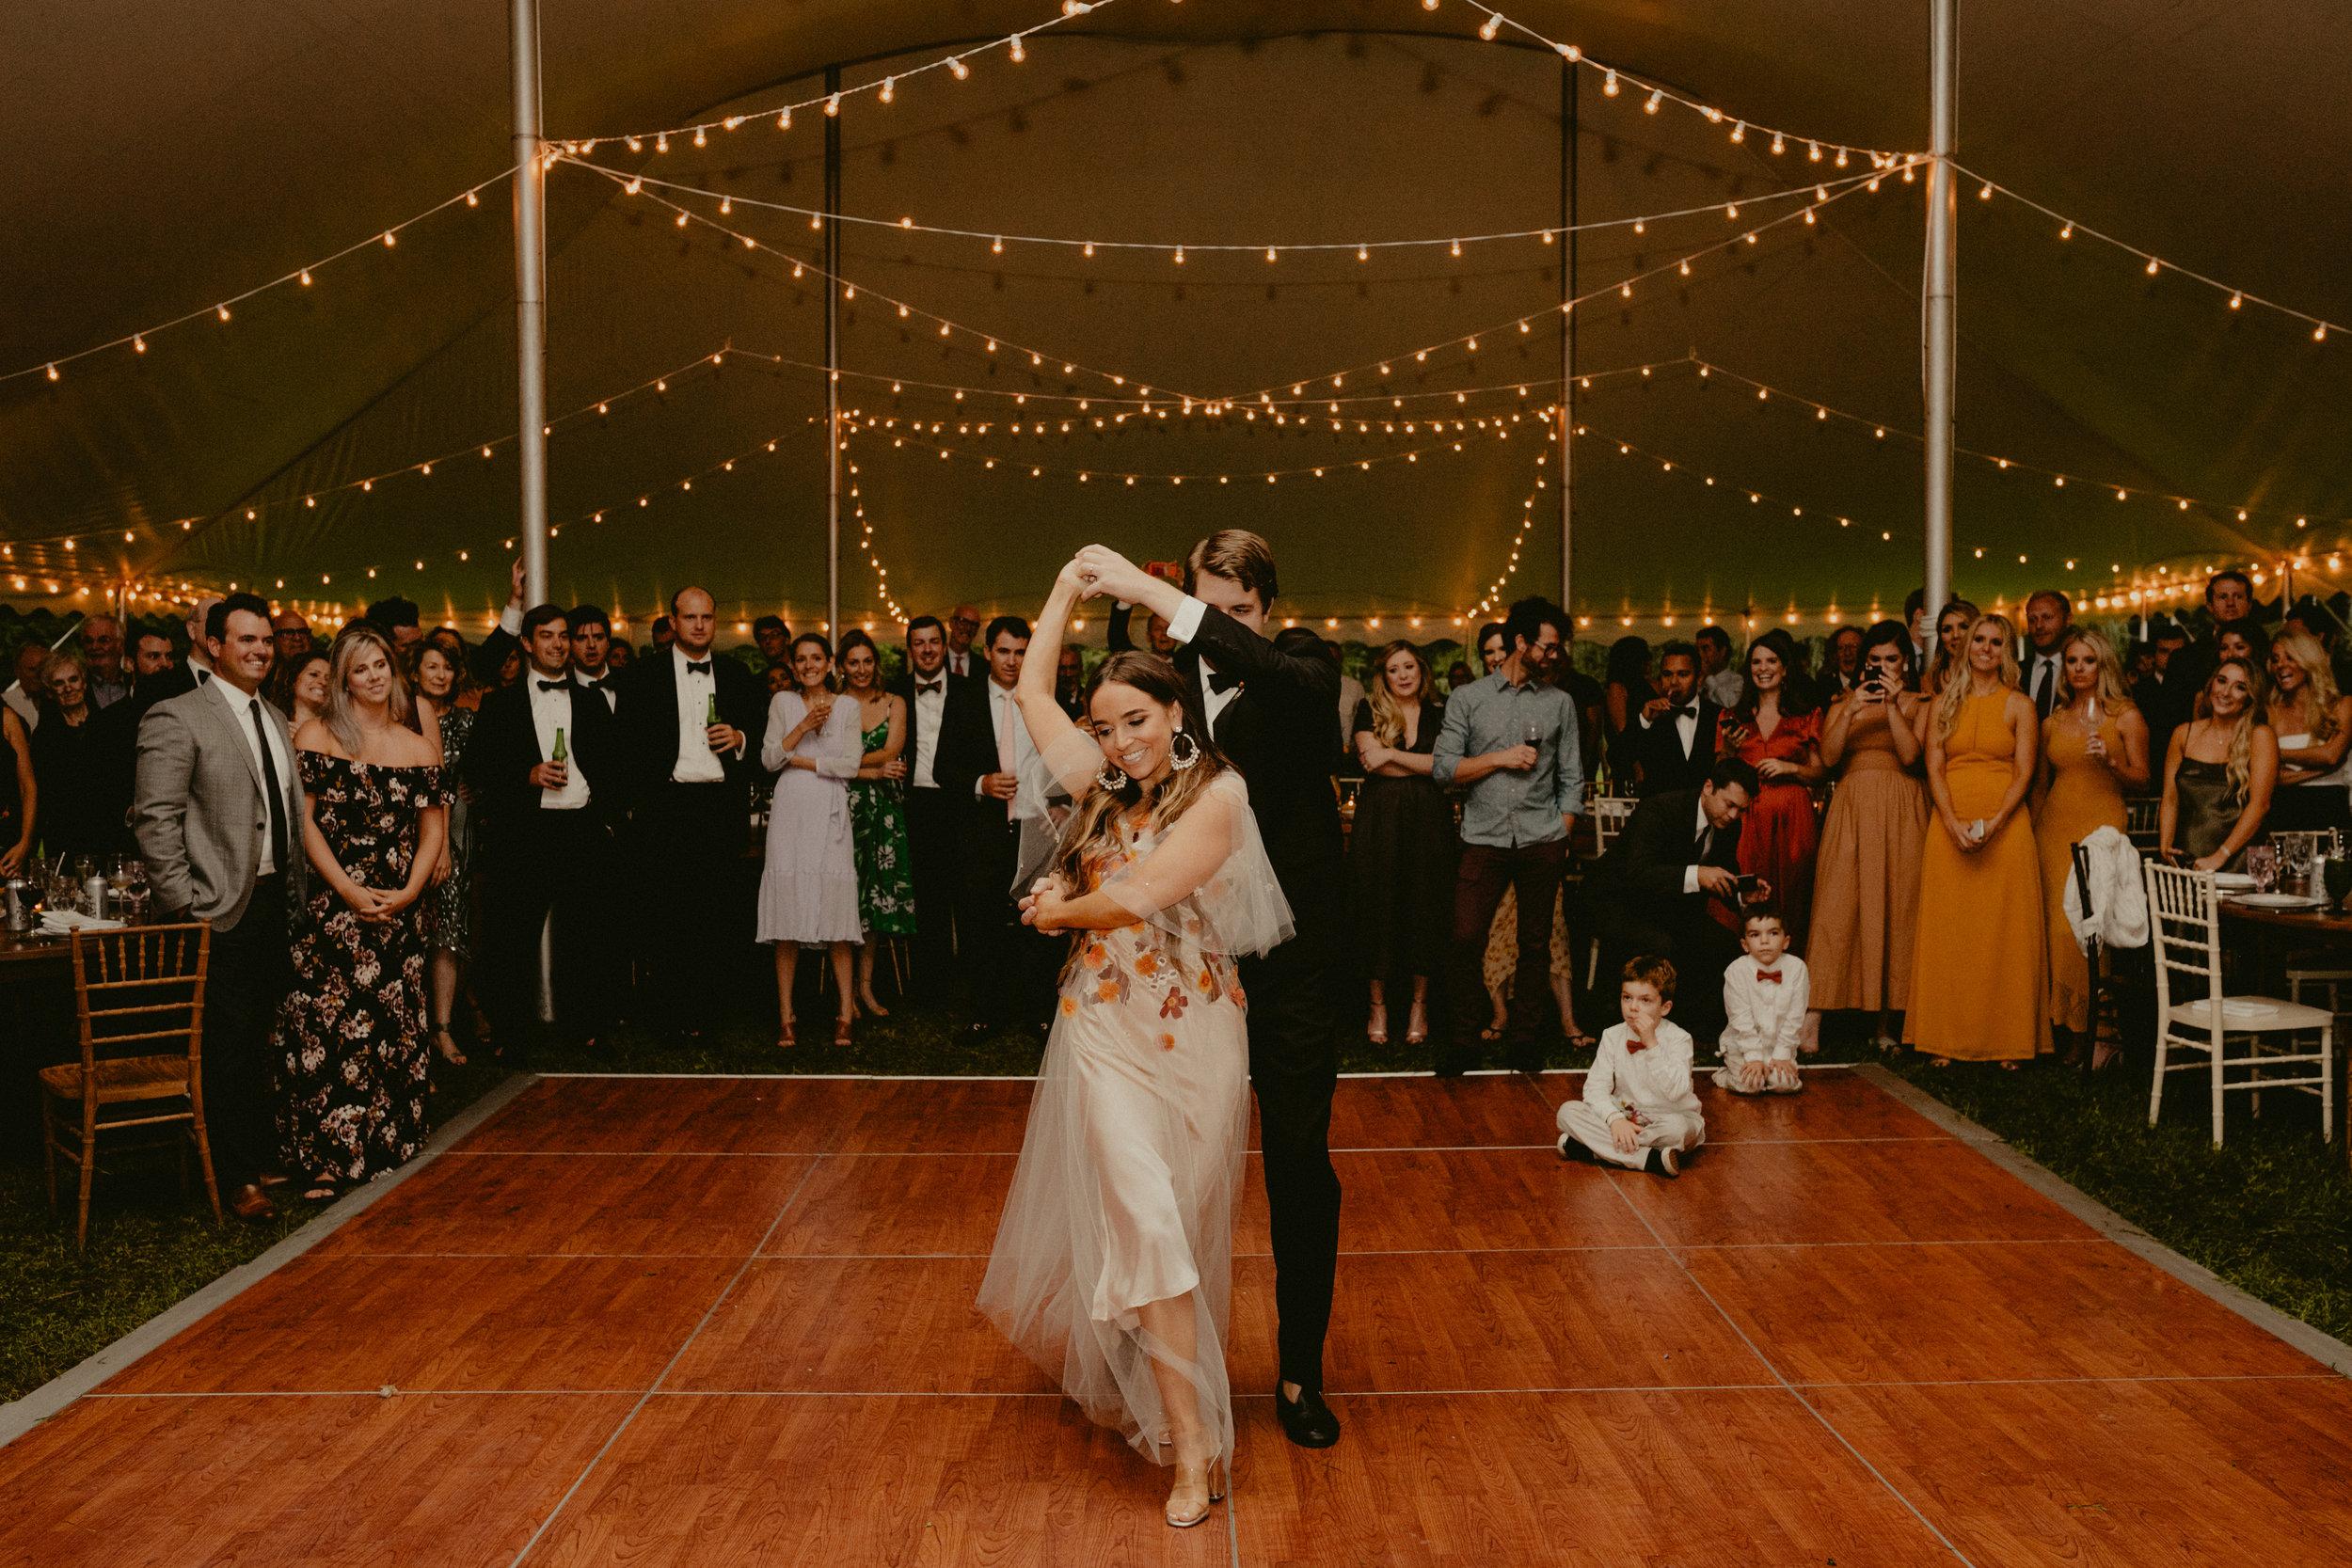 DEER_MOUNTAIN_INN_WEDDING_CHELLISE_MICHAEL_PHOTOGRAPHY-1508.jpg